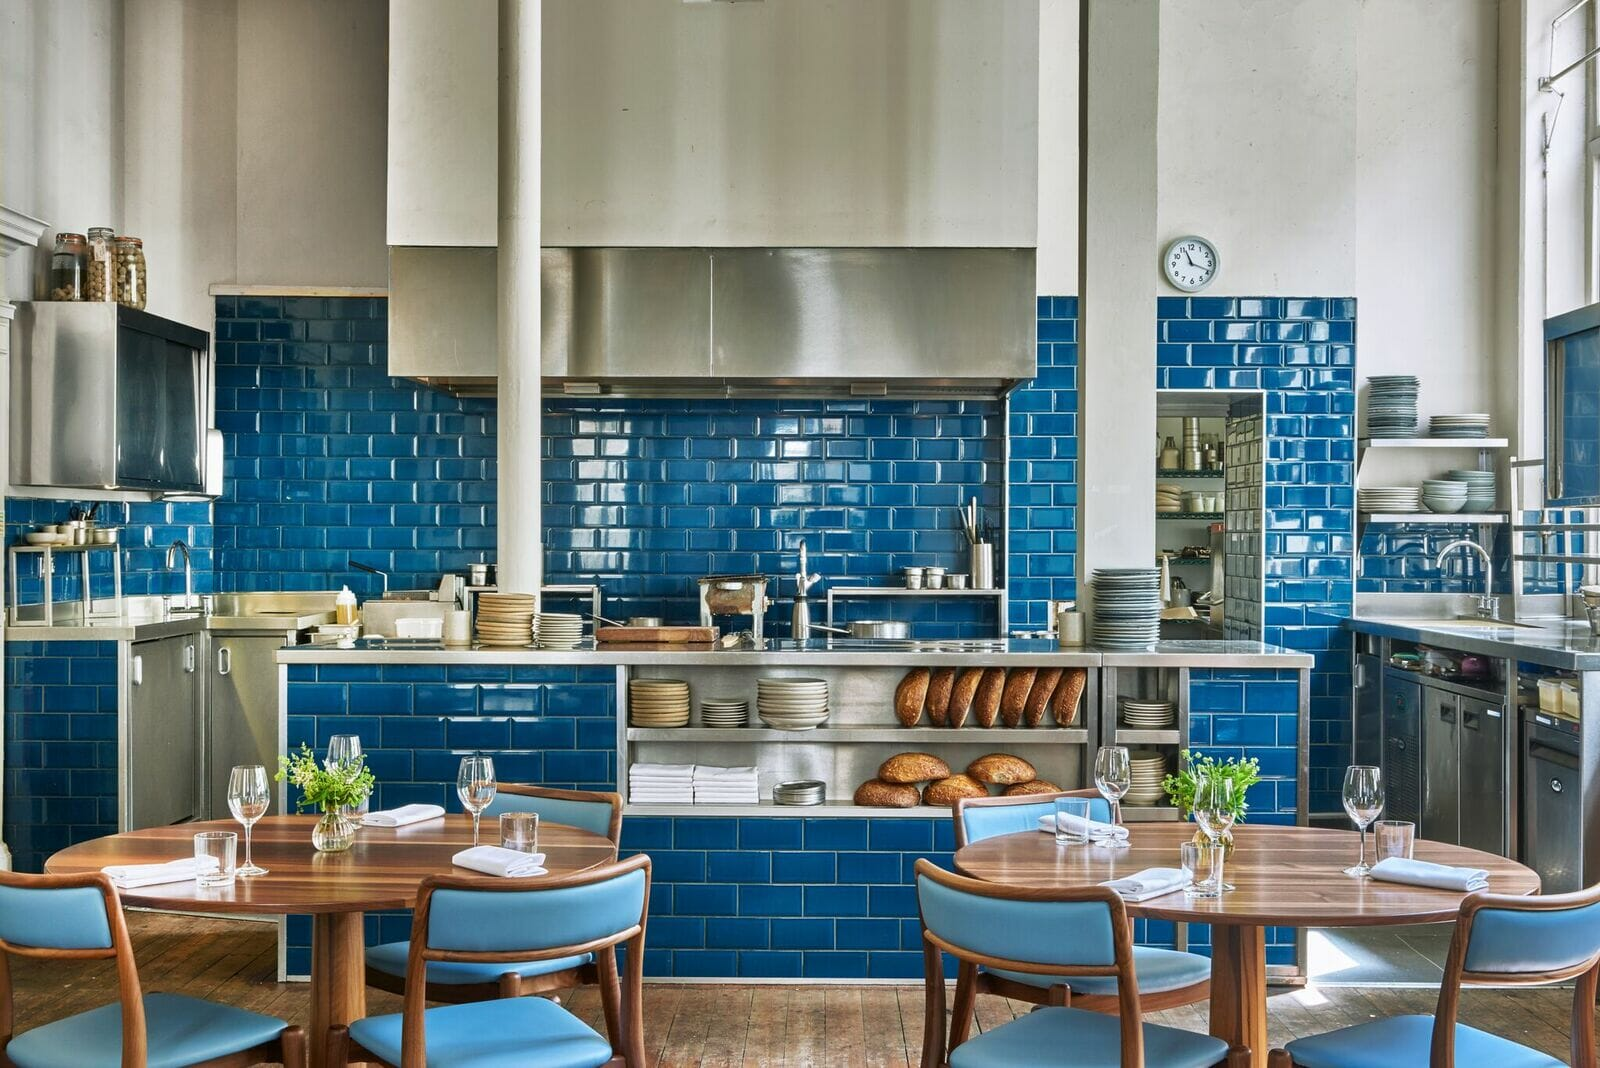 clove club shoreditch restaurant